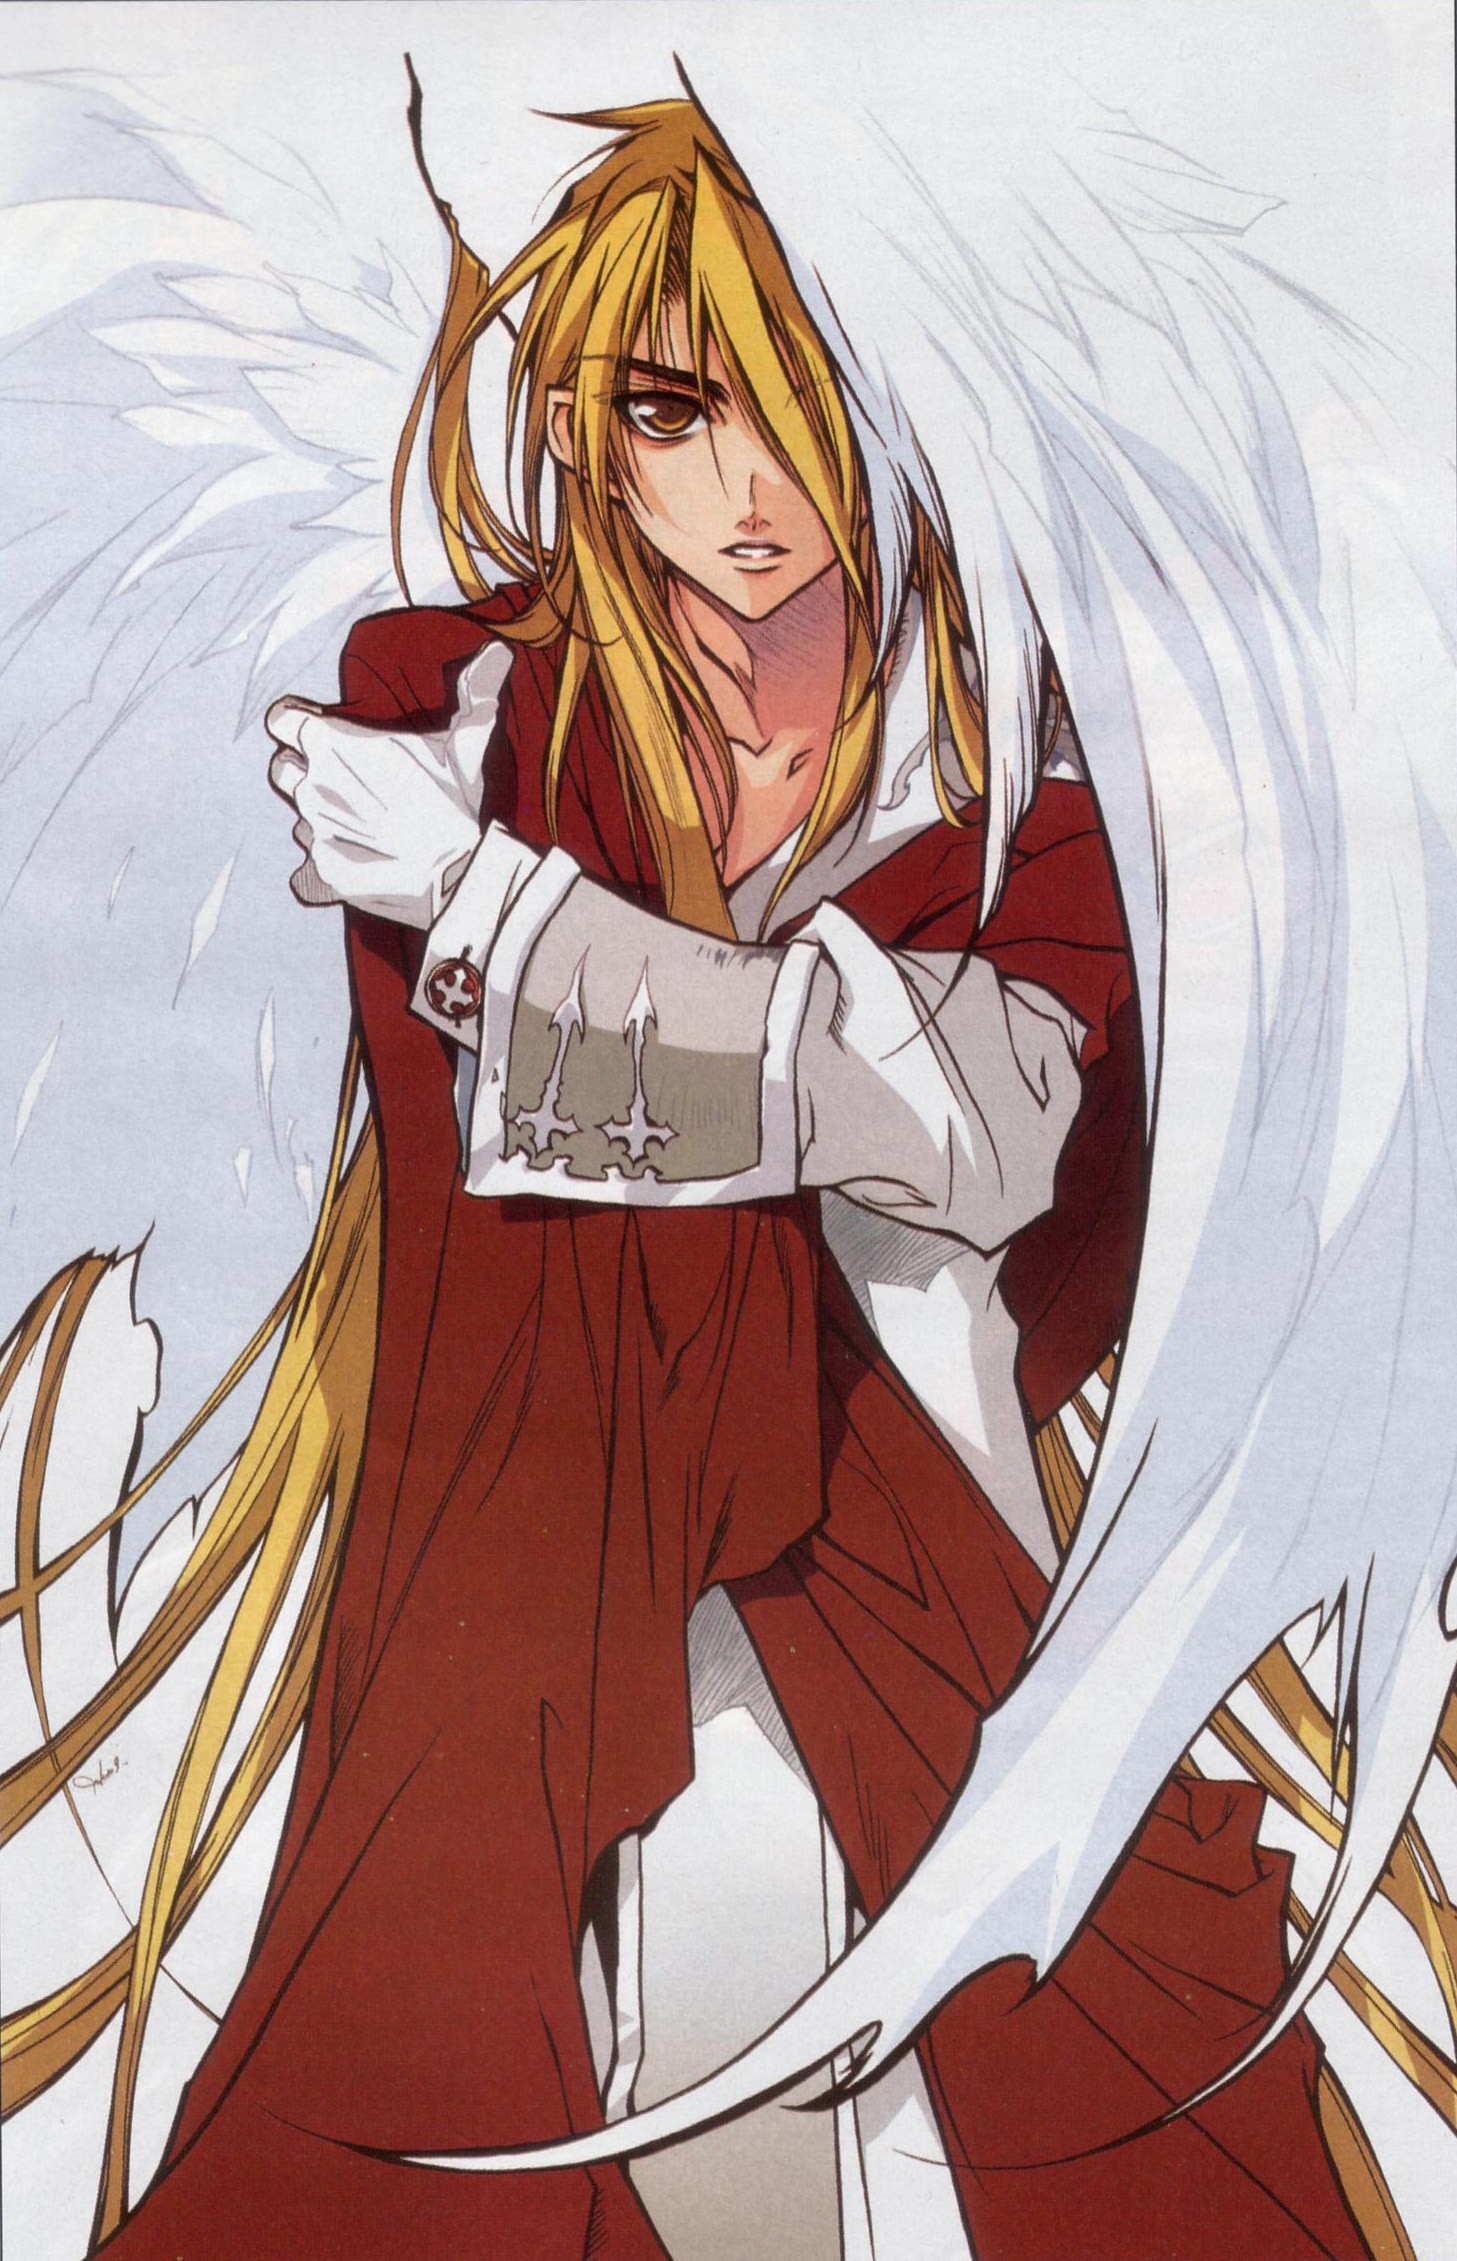 D.N.Angel - Sugisaki Yukiru - Zerochan Anime Image Board